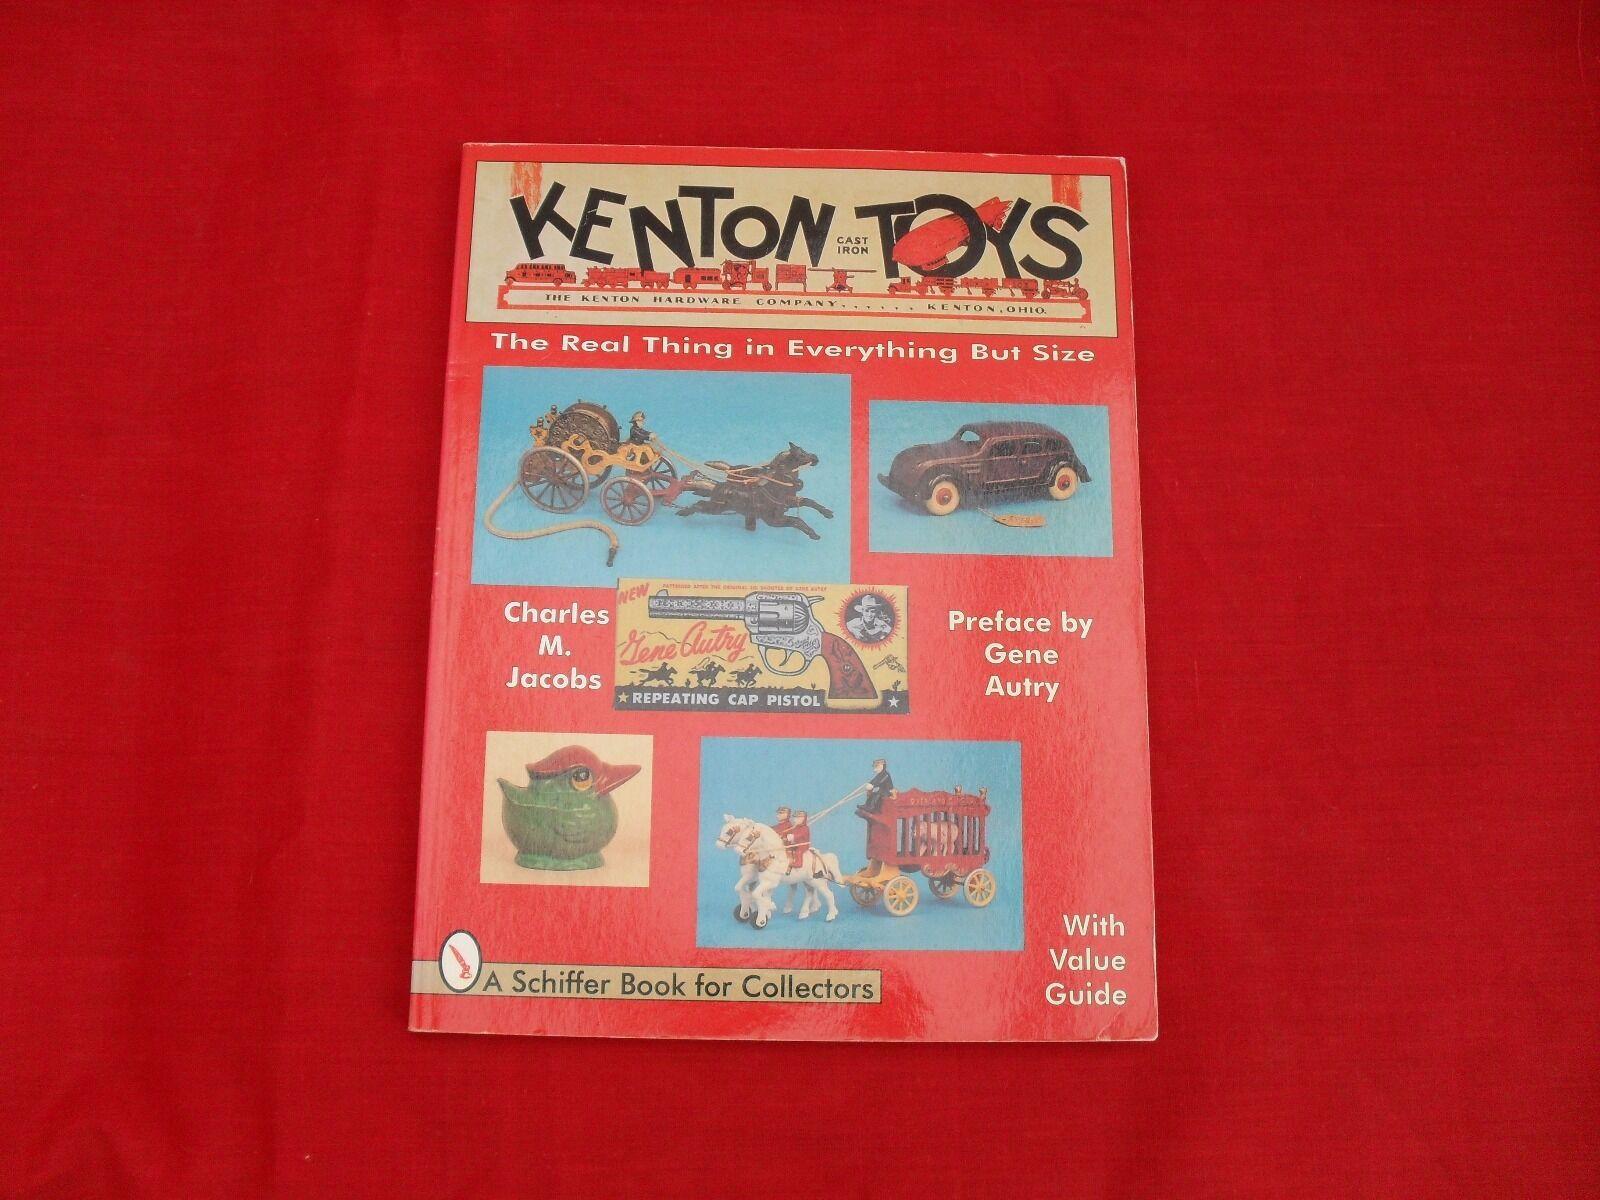 KENTON CAST IRON  TOYS  1890- 1950 UNITED STATES OF AMERICA